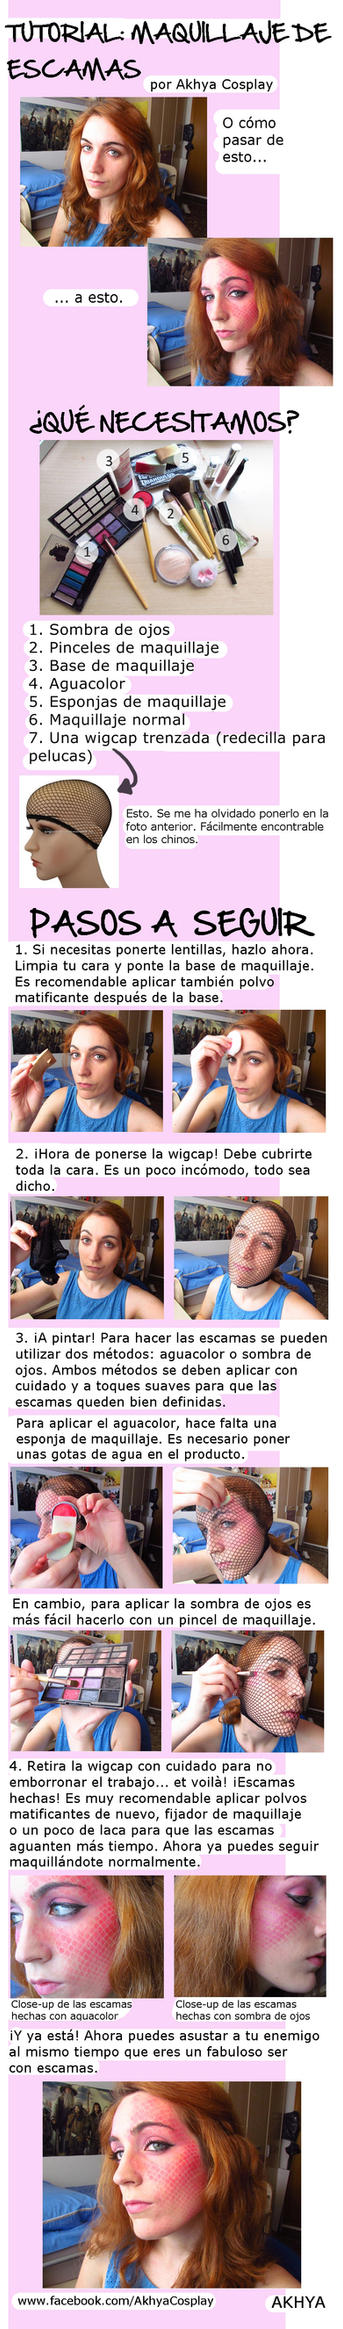 Escamas - Makeup tutorial by Akhya